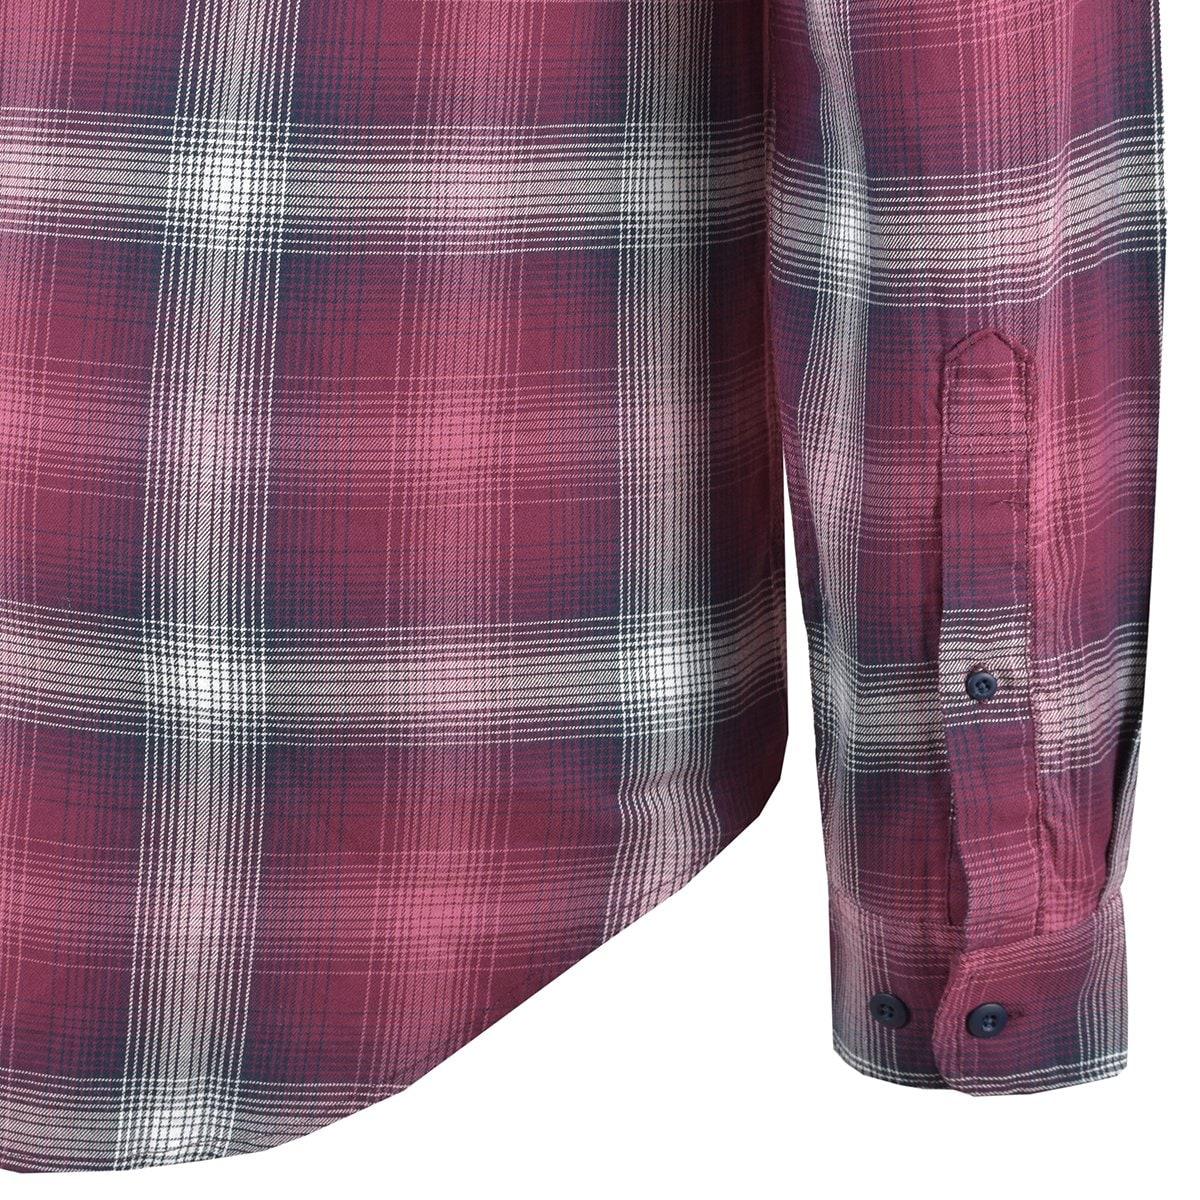 Camisa Manga Larga Cuadros Jeanious Plus Jnmx219-Oc0158